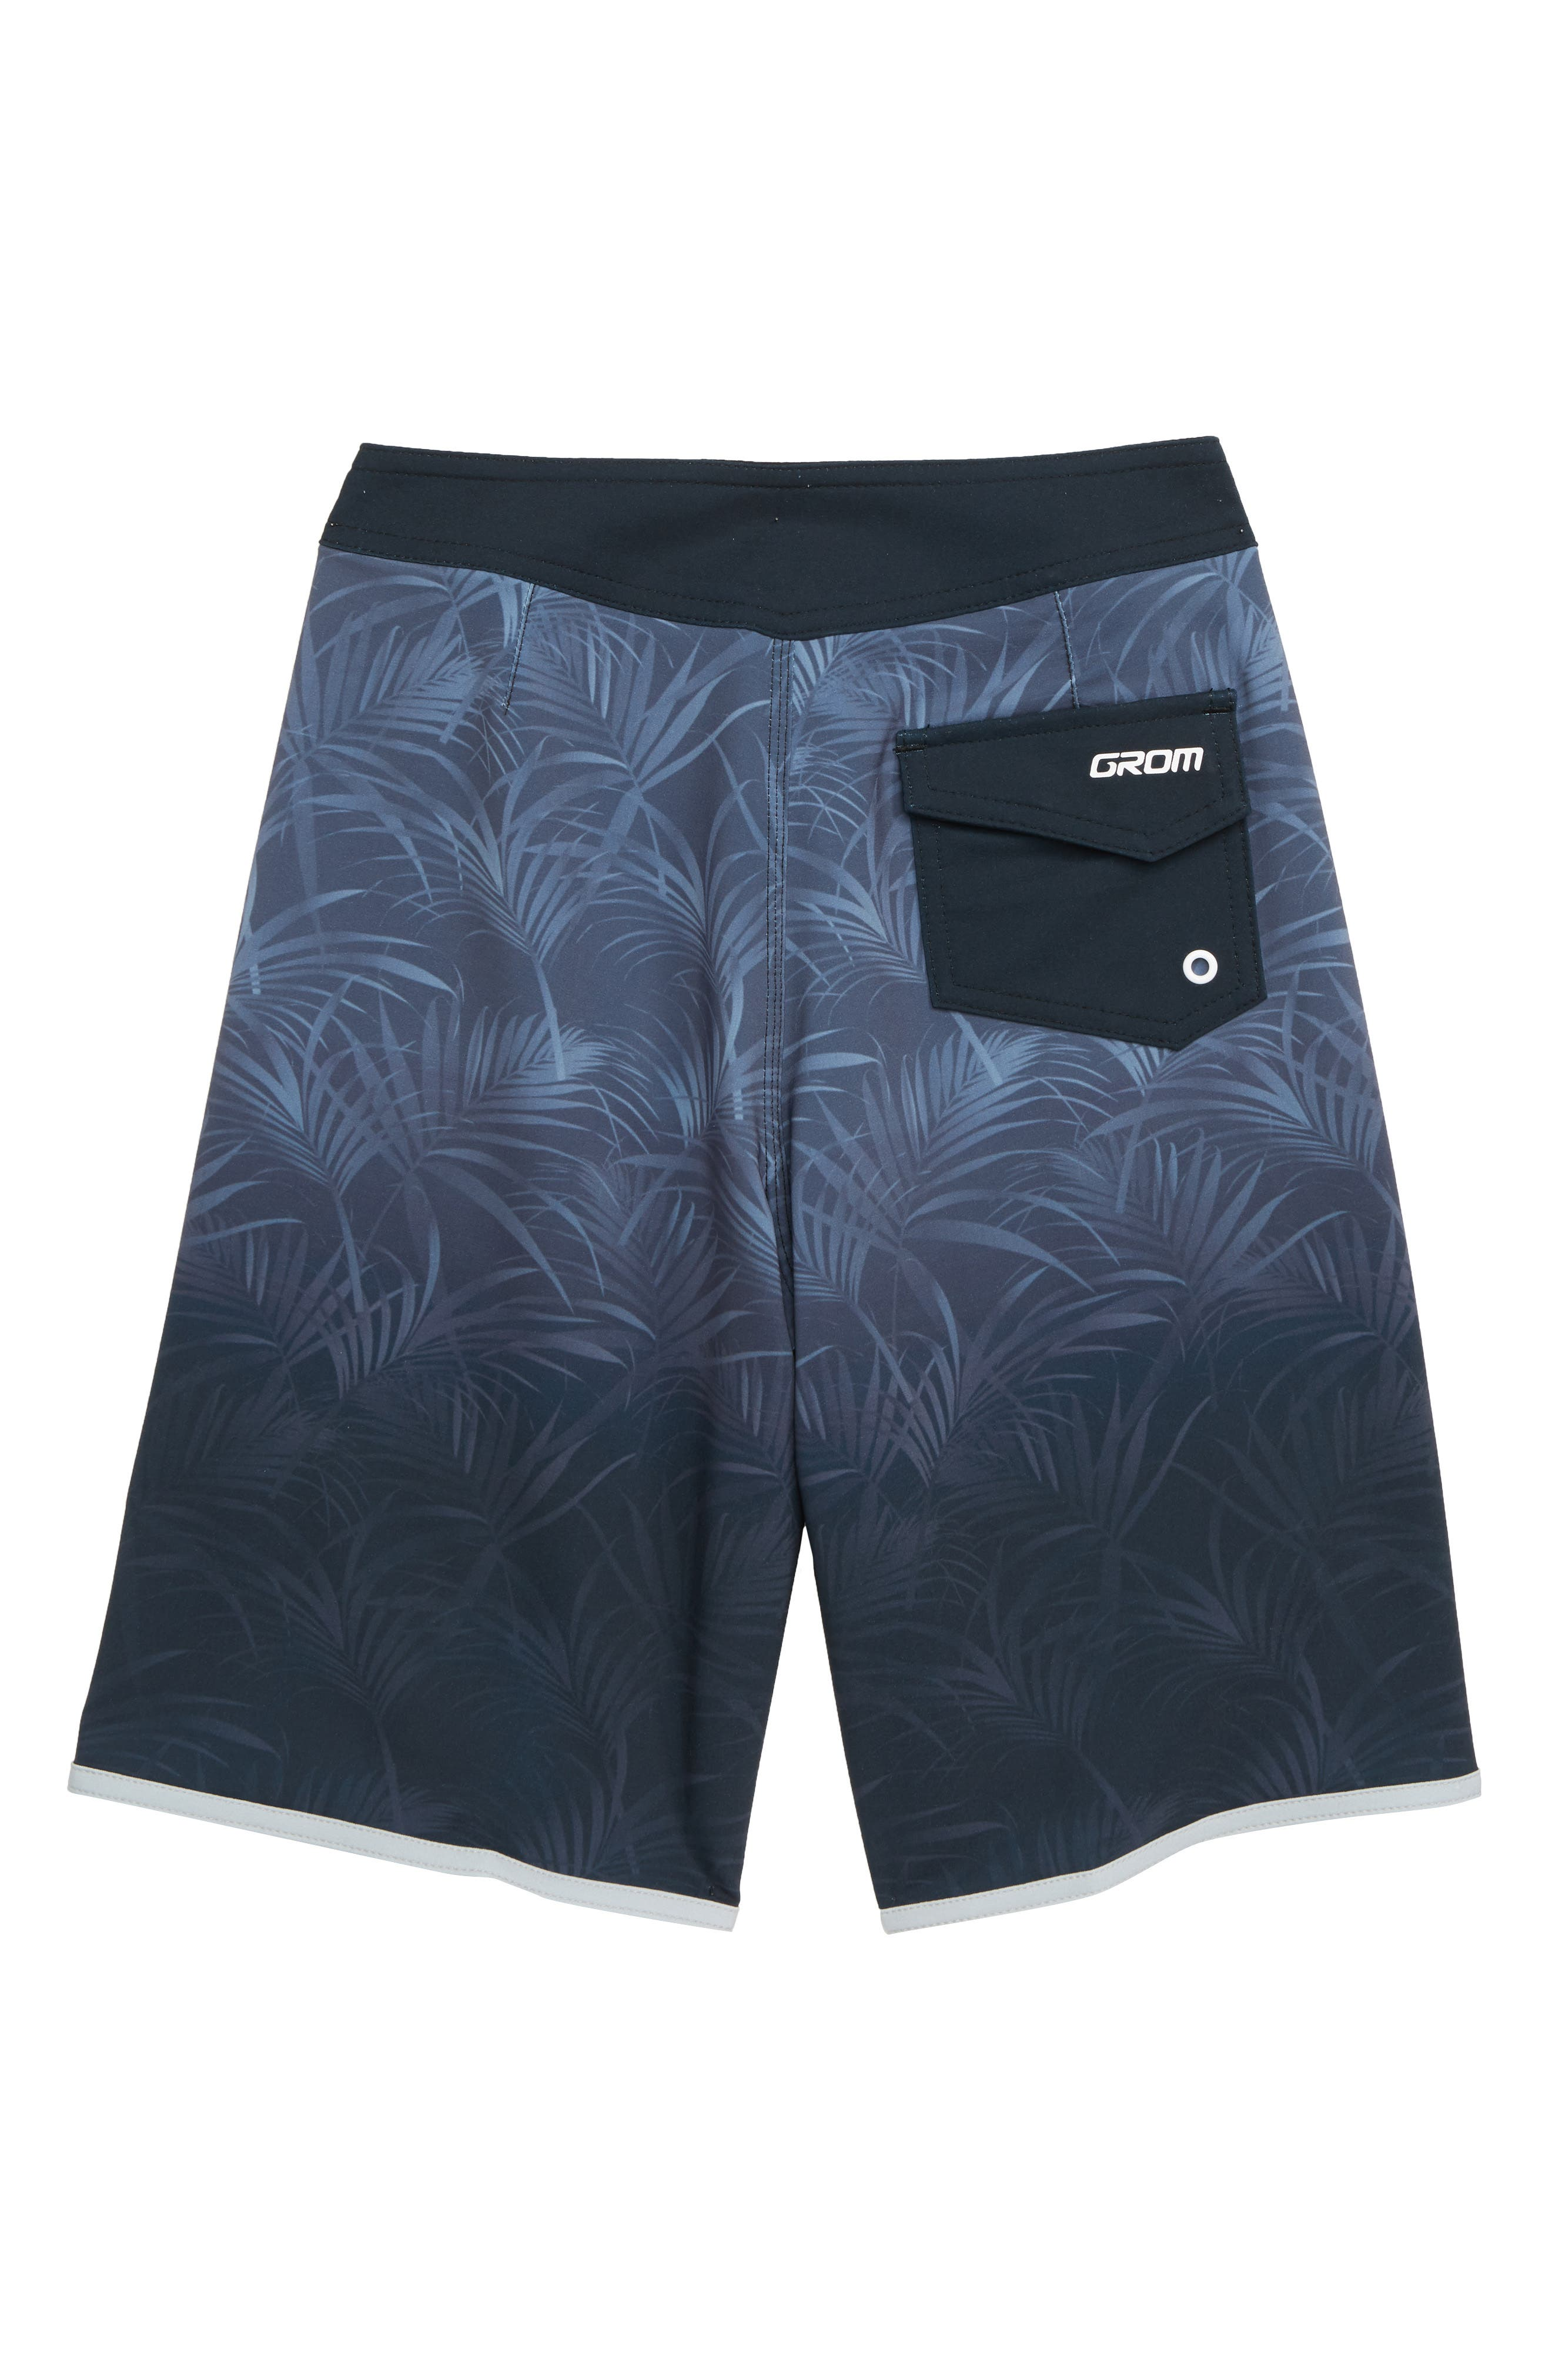 Palm Fade Board Shorts,                             Alternate thumbnail 2, color,                             BLACK